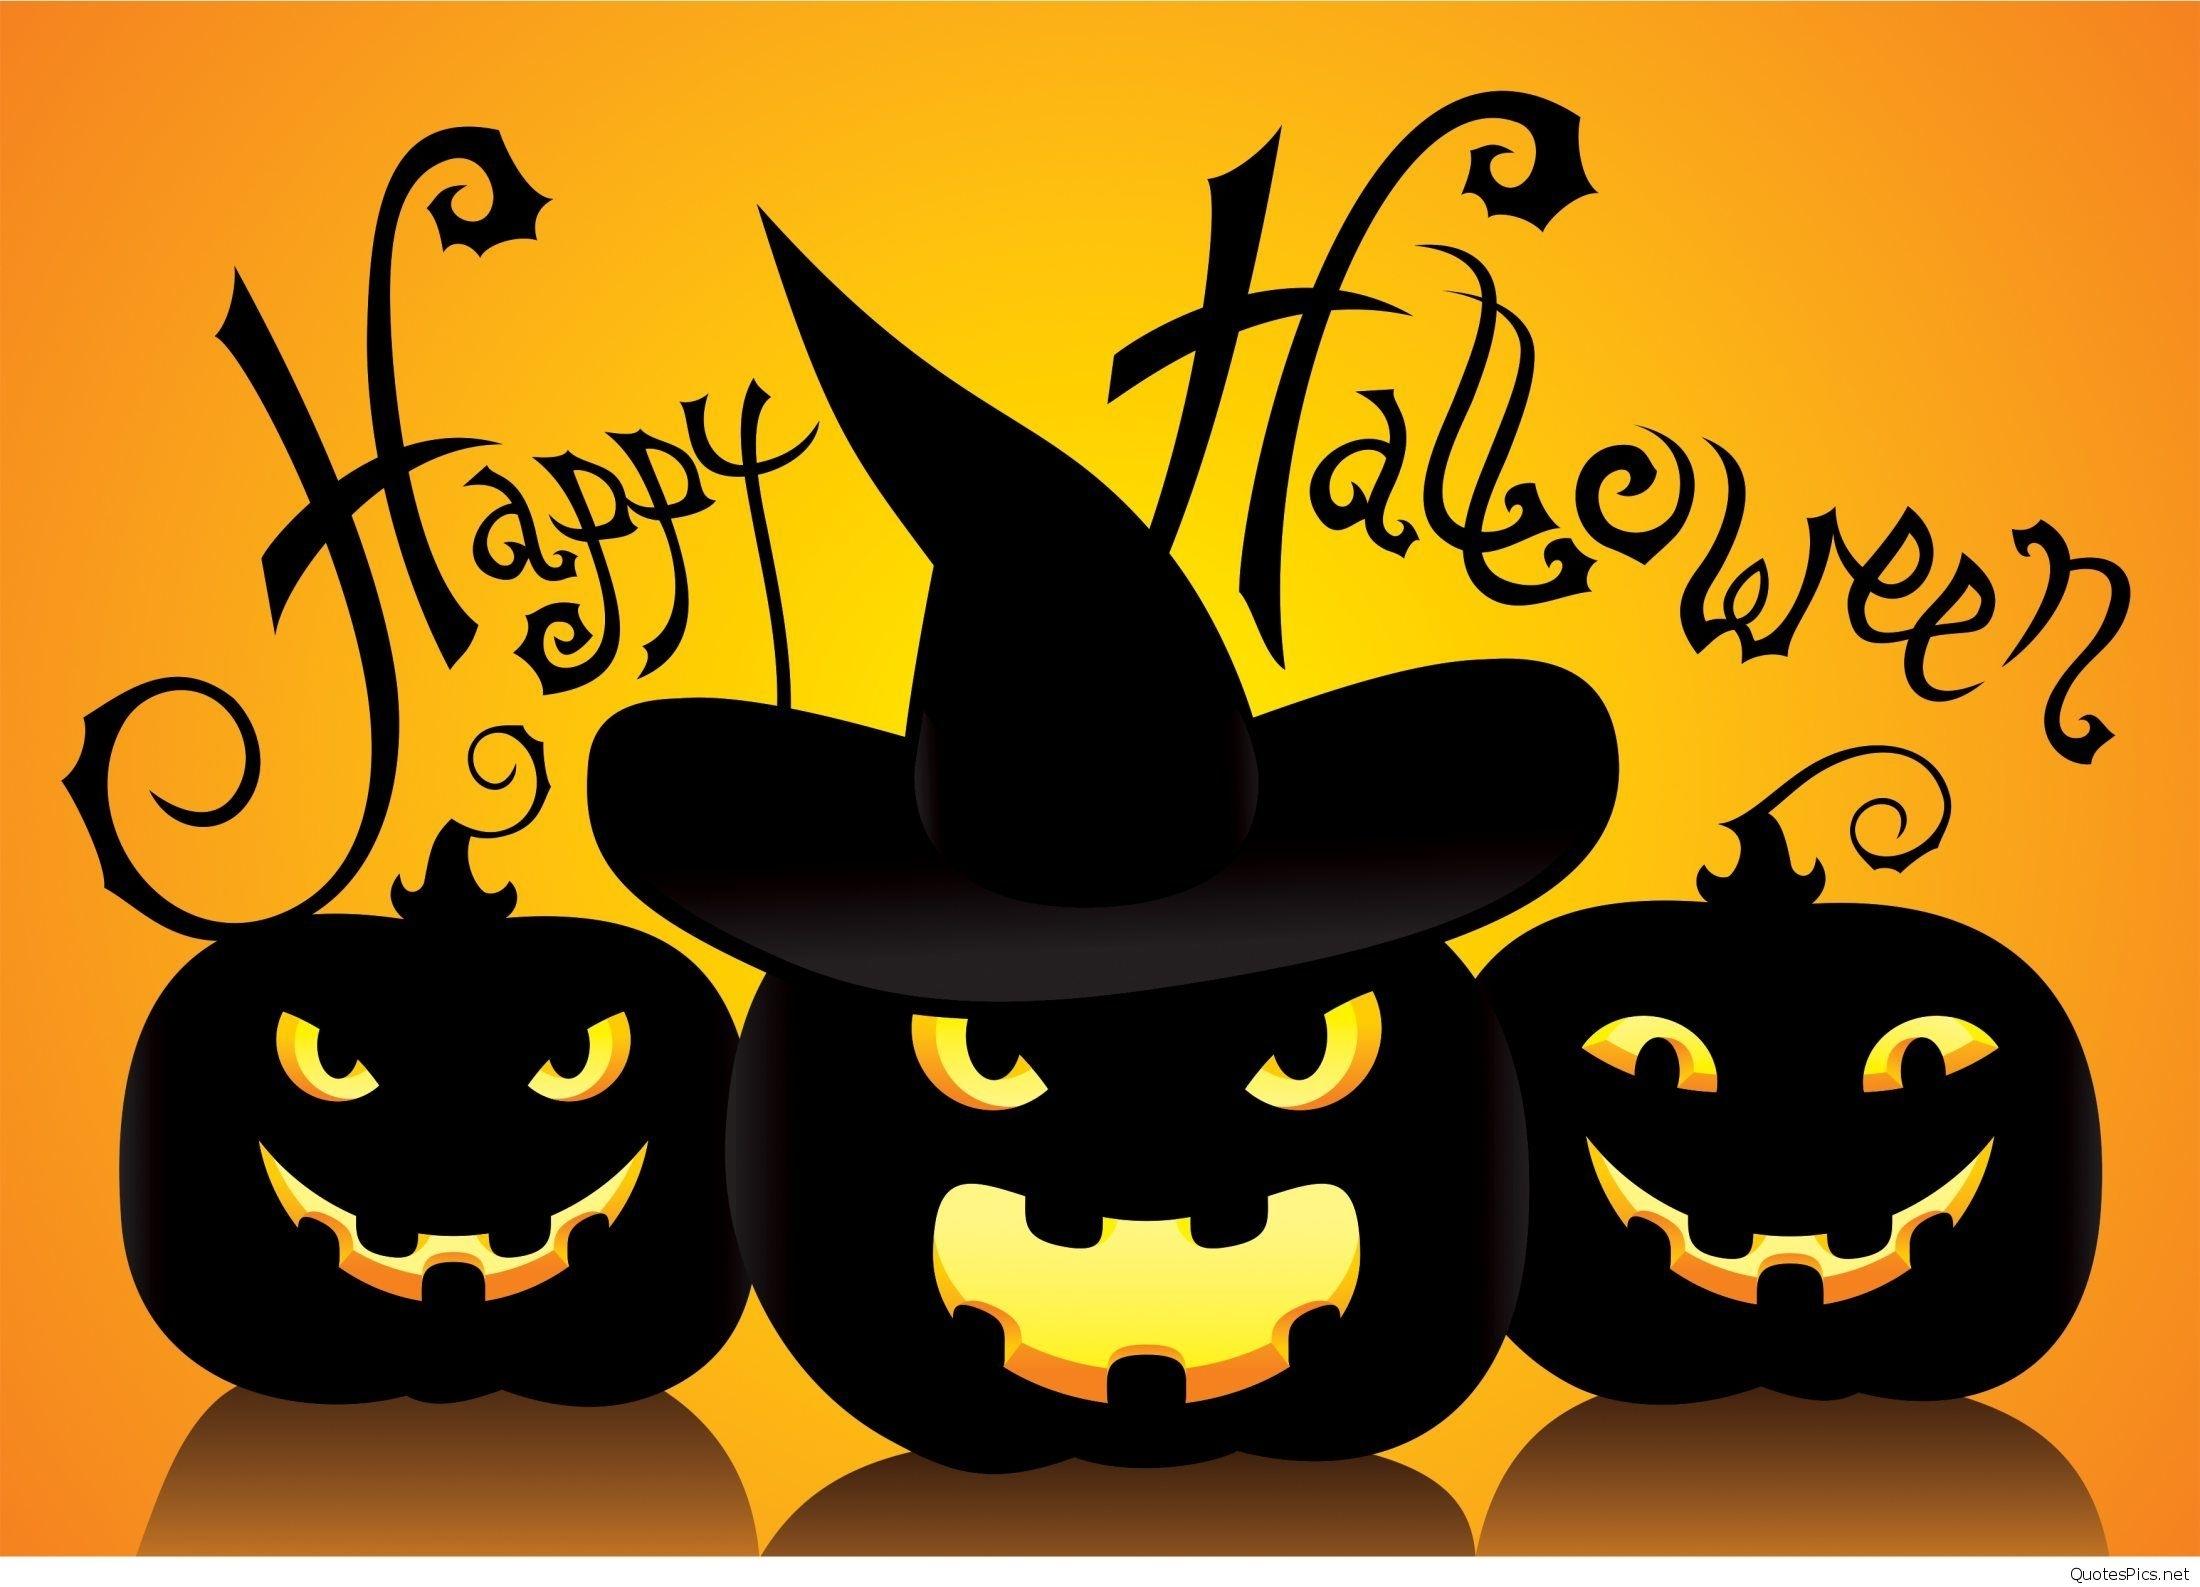 happy halloween wallpapers, , sayings cartoons 2016